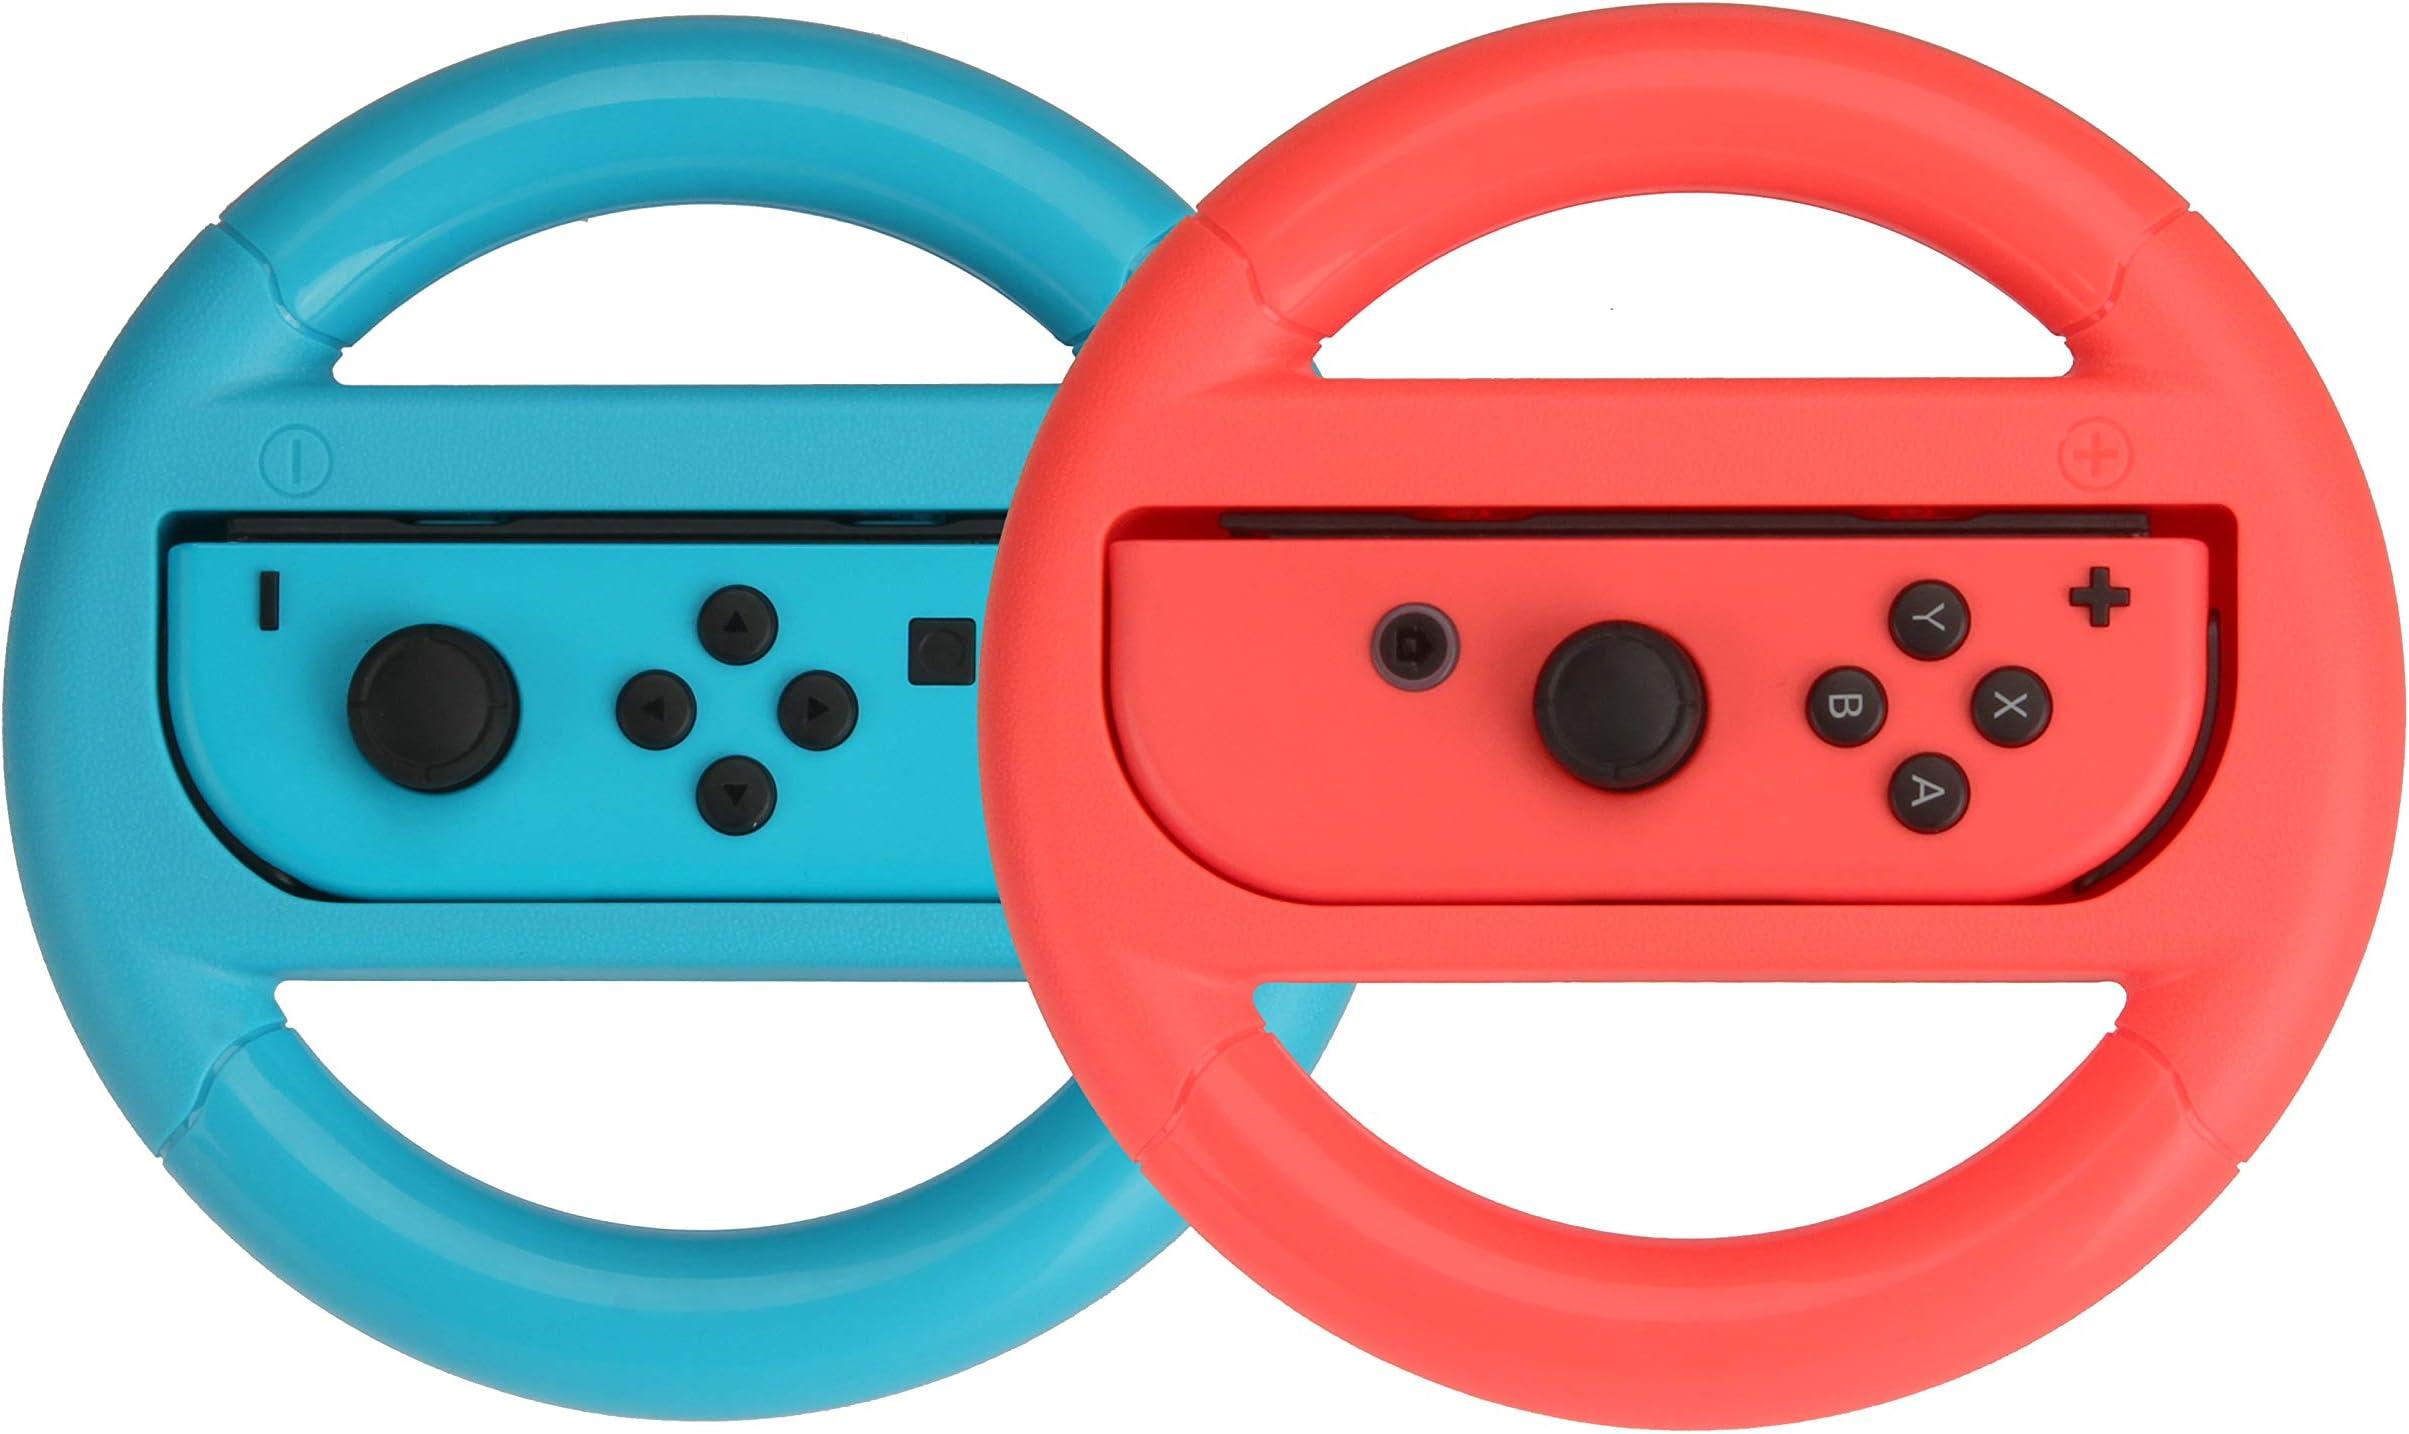 c761a44fce3 Amazon.com: AmazonBasics Steering Wheel Controller for Nintendo ...